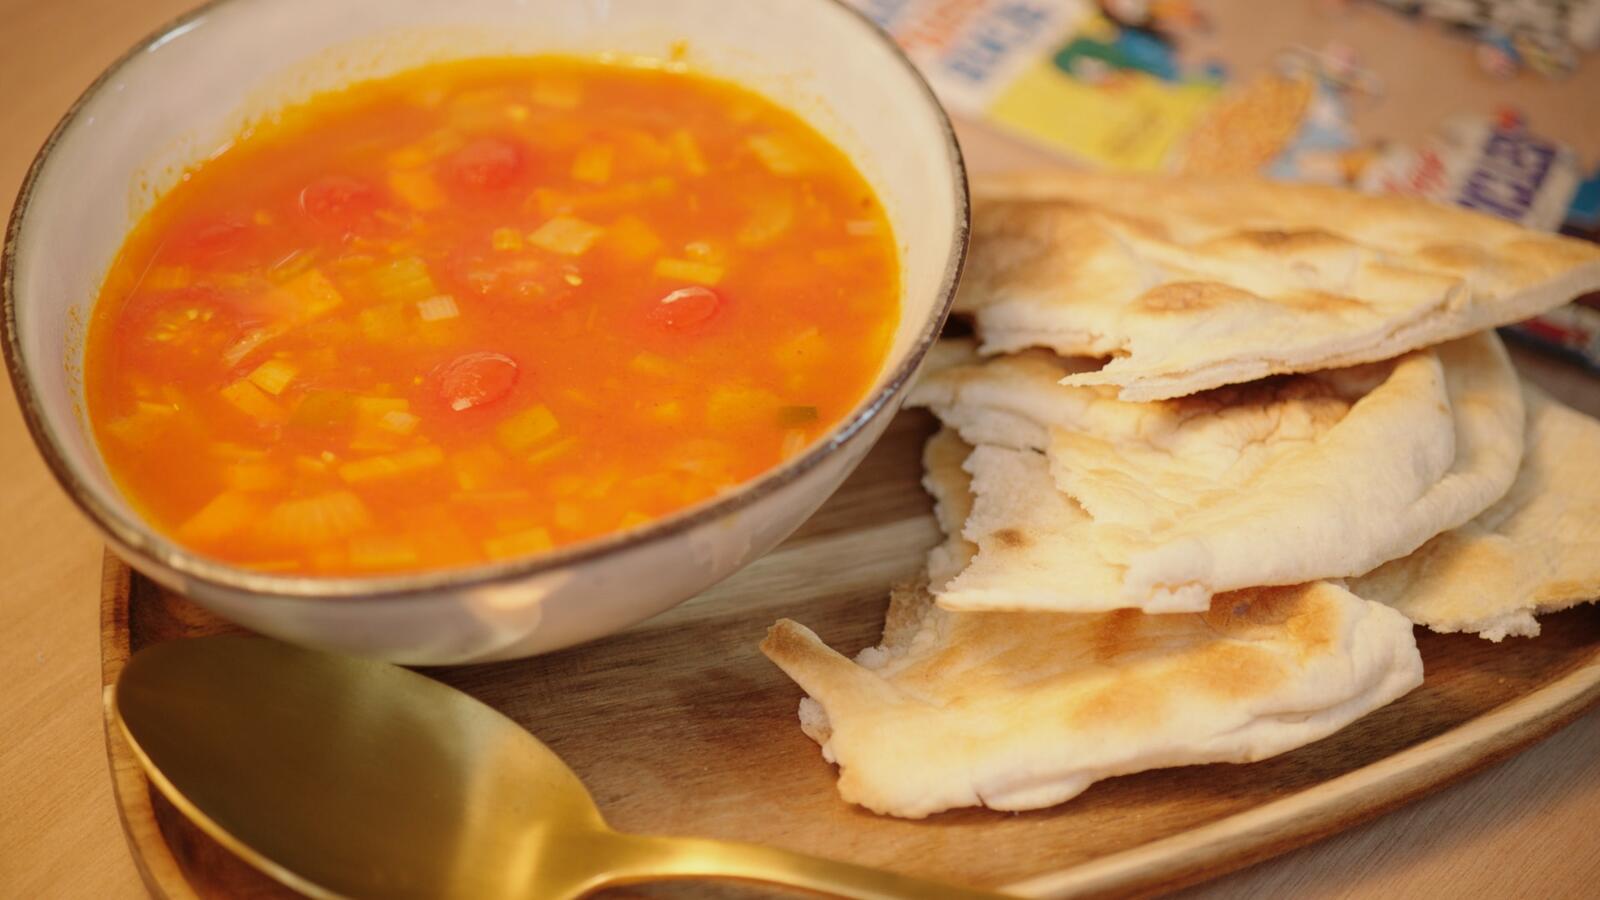 Wortel/kerstomatensoep met rode curry